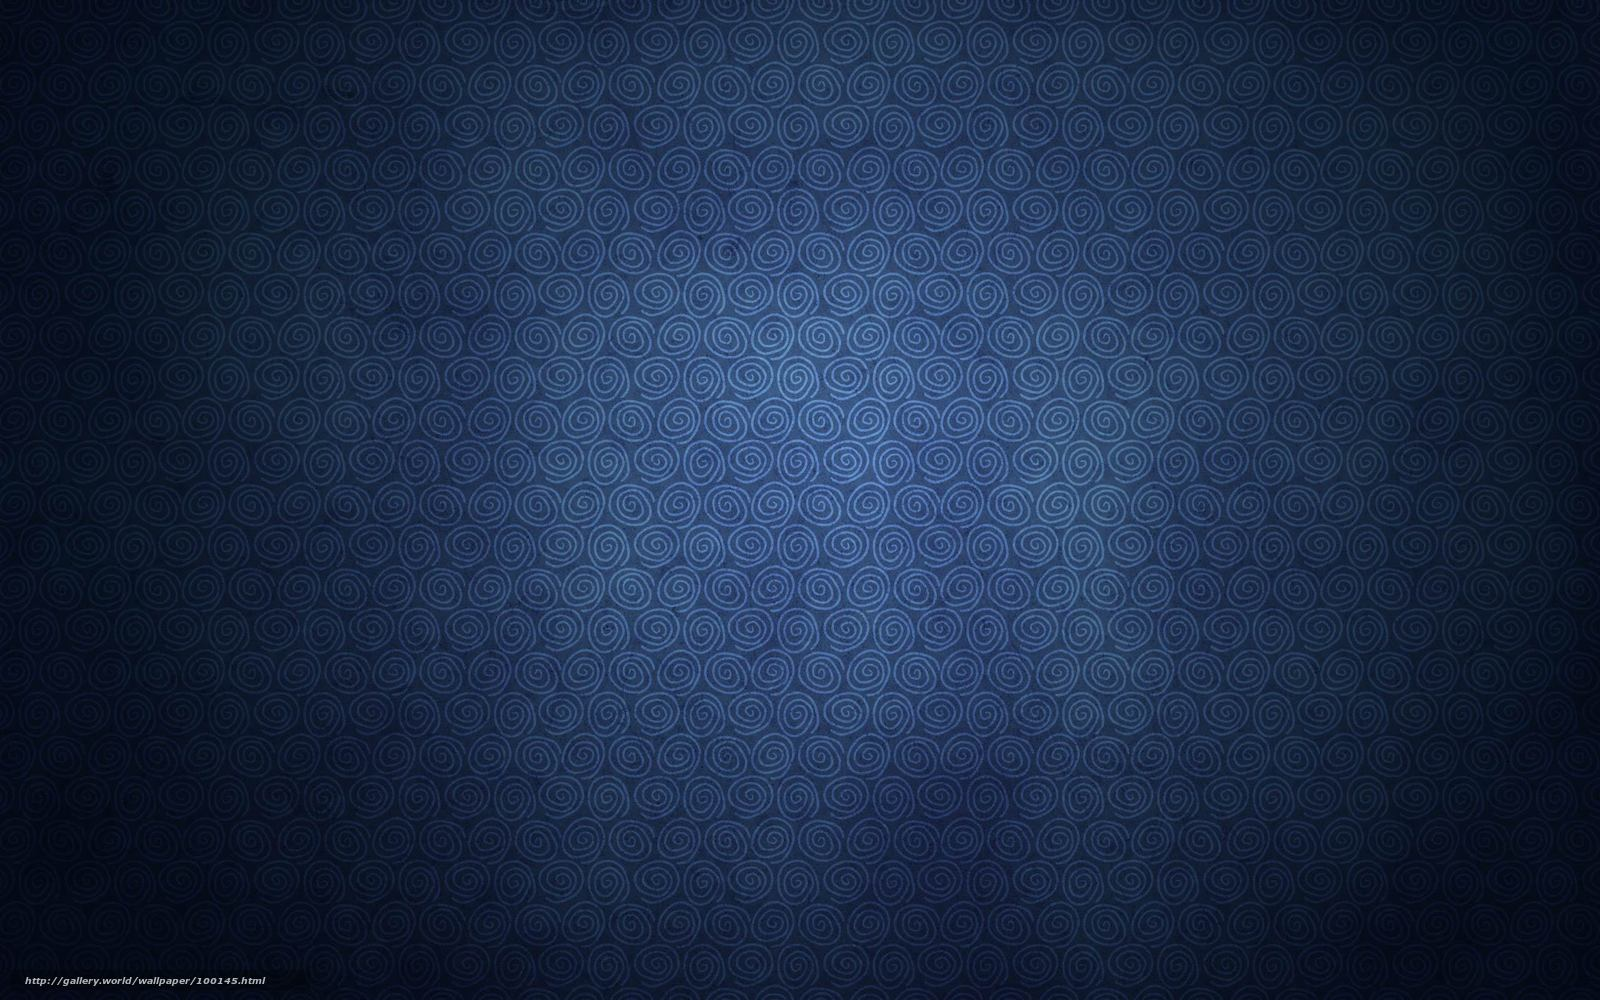 tlcharger fond d u0026 39 ecran texture  bleu  modle  image fonds d